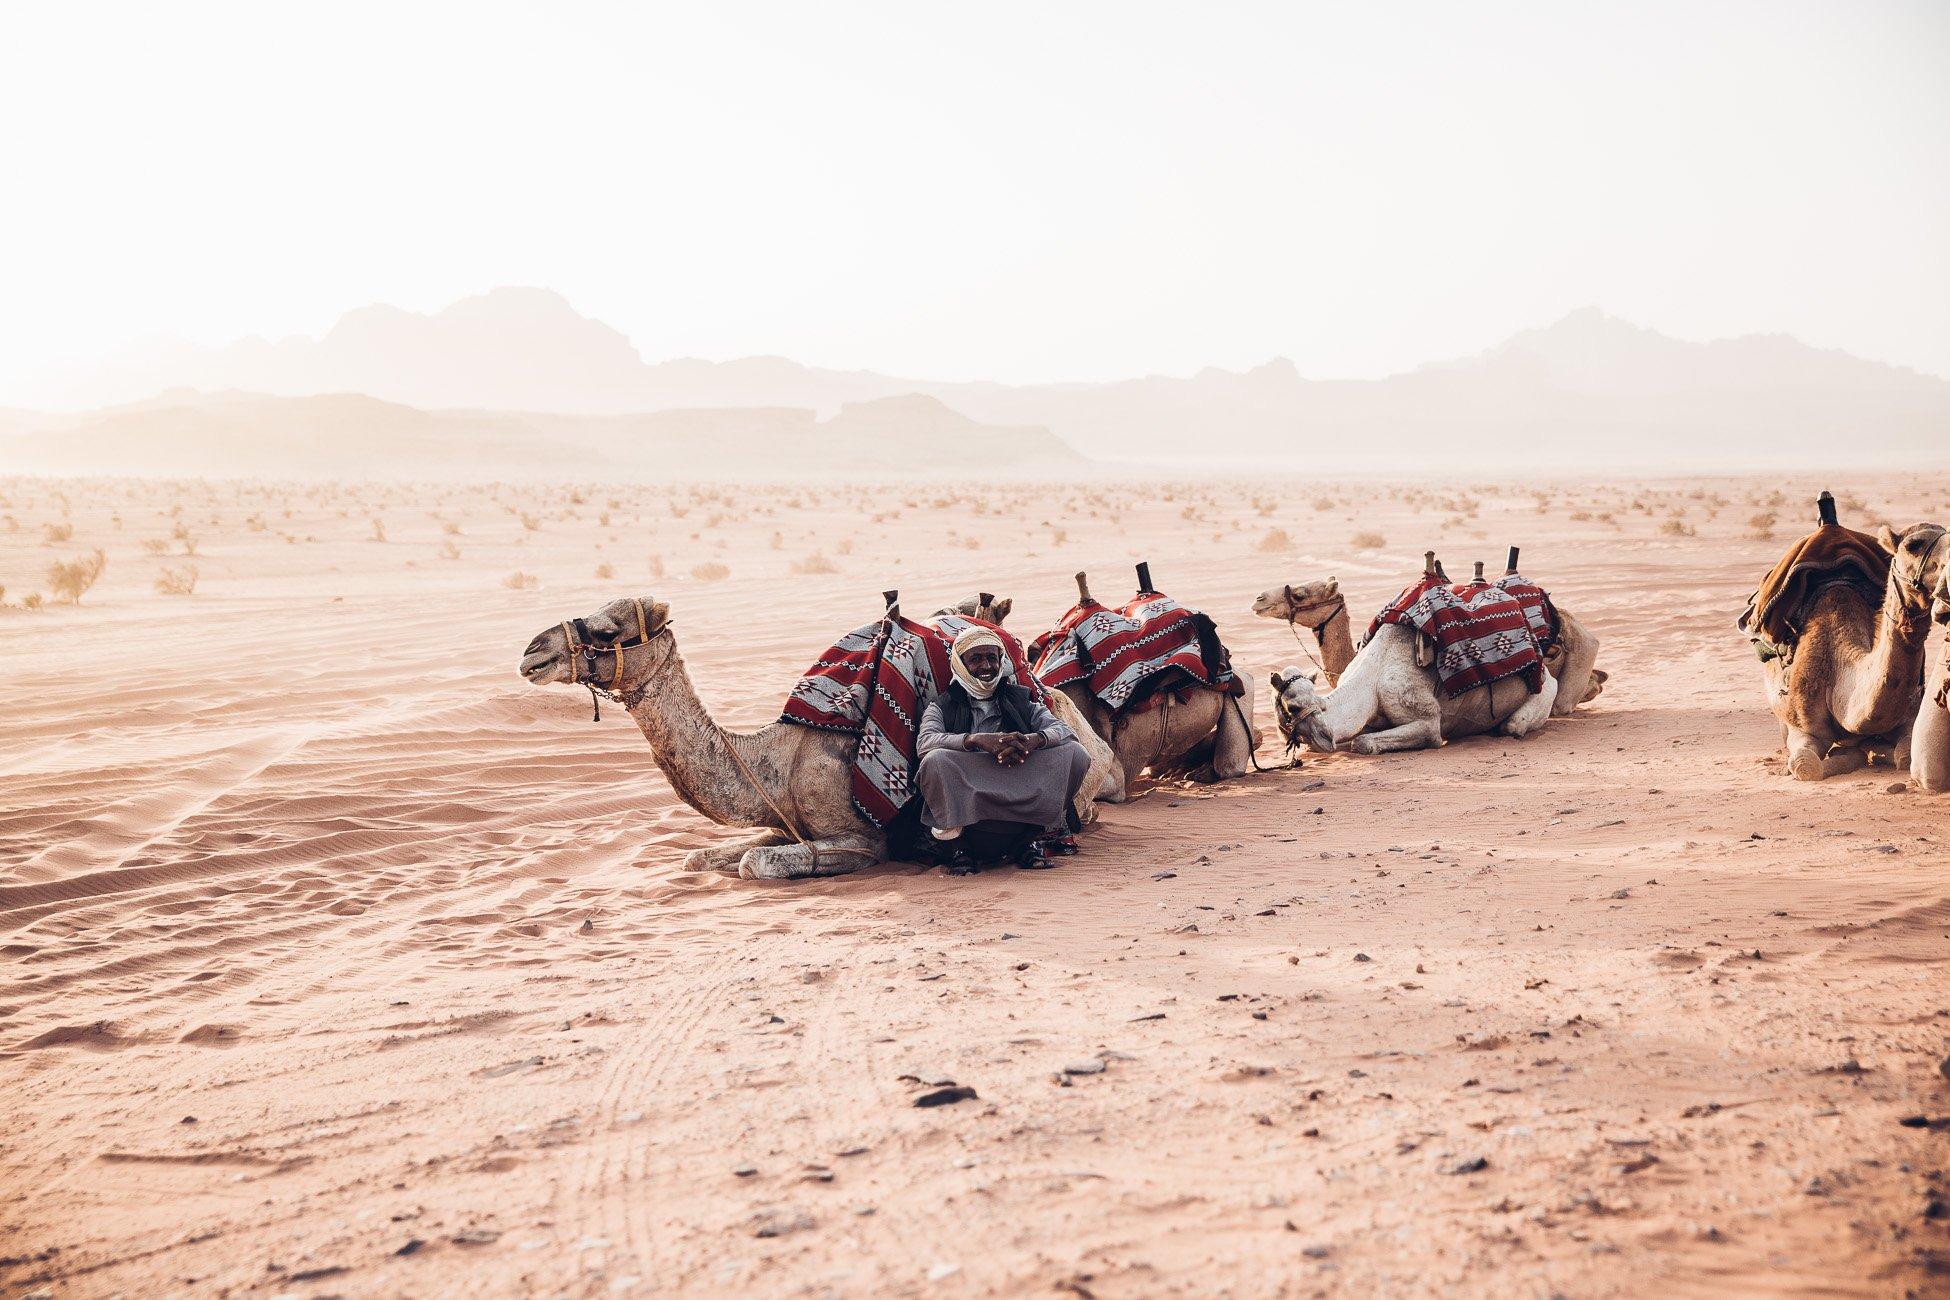 Bedouin in Jordan Wadi Rum